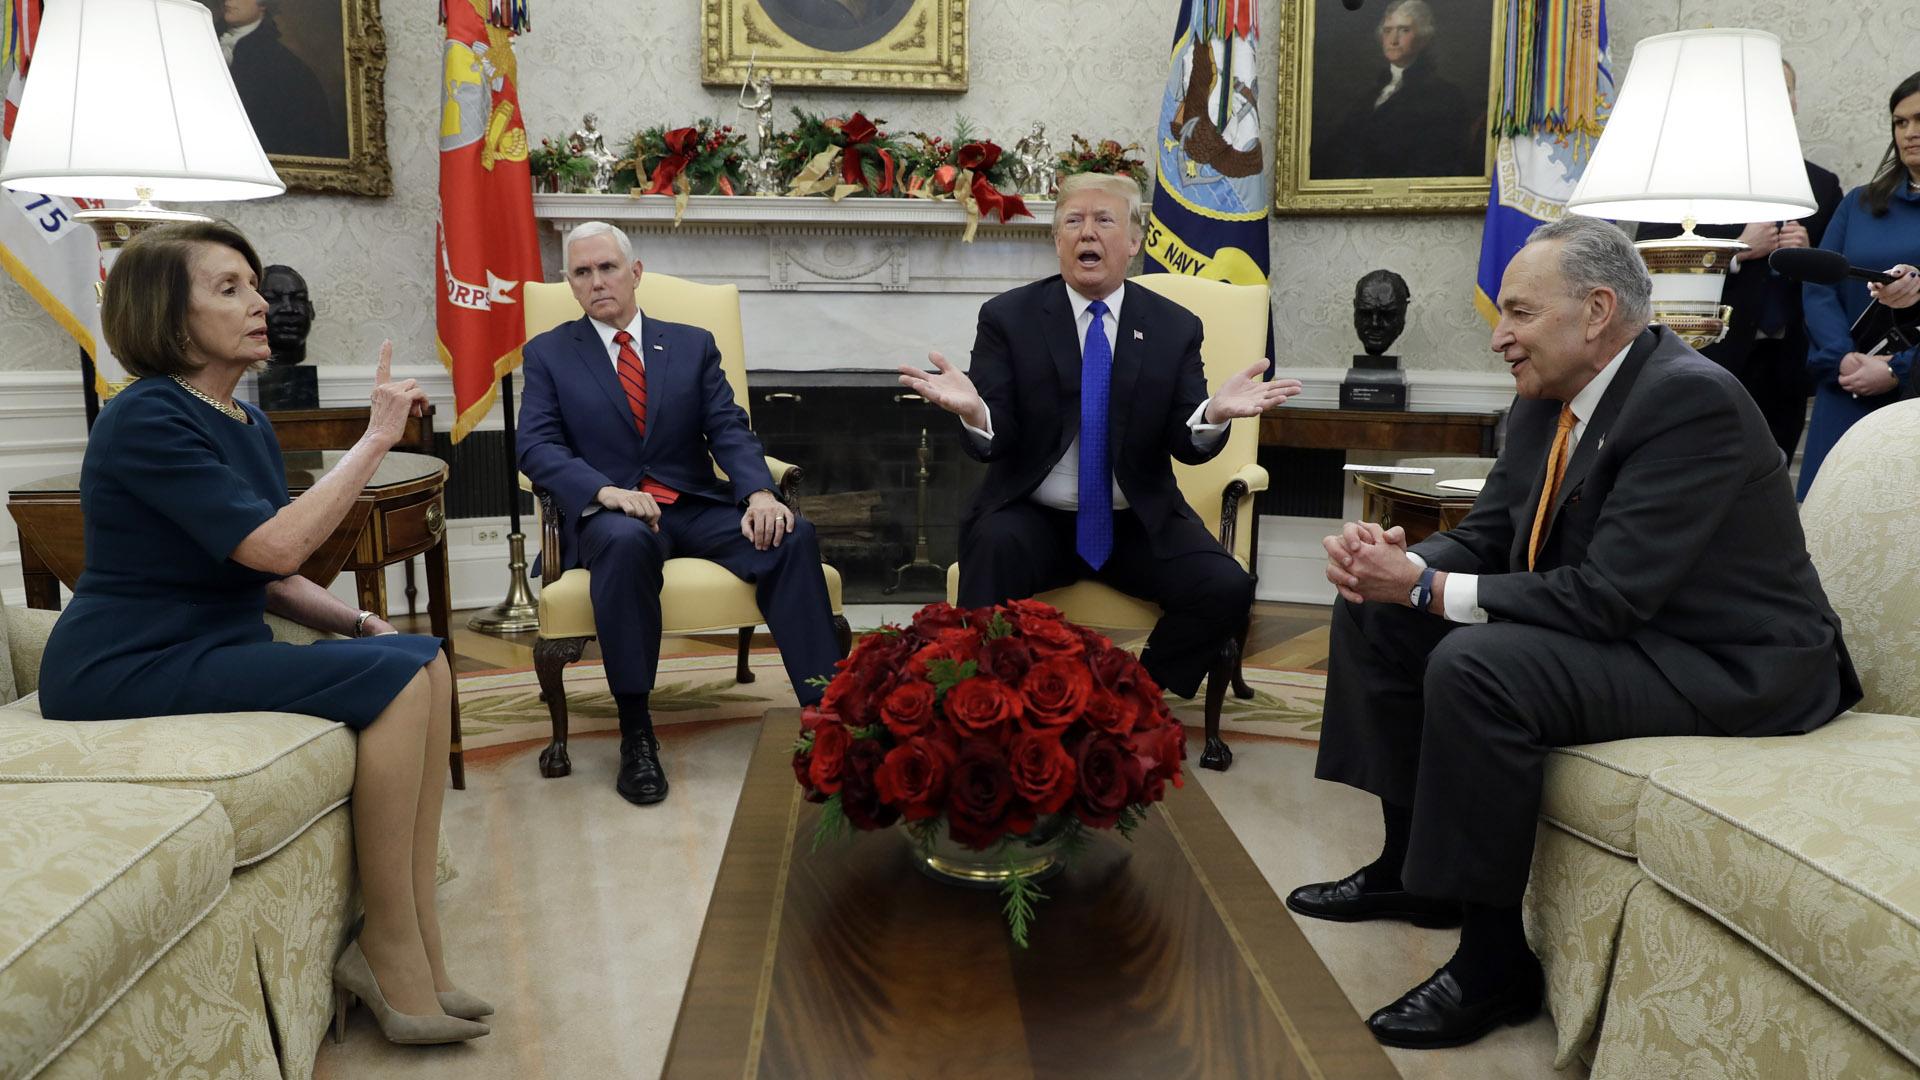 president donald trump democratic leaders white house 121118 AP_1545009183299